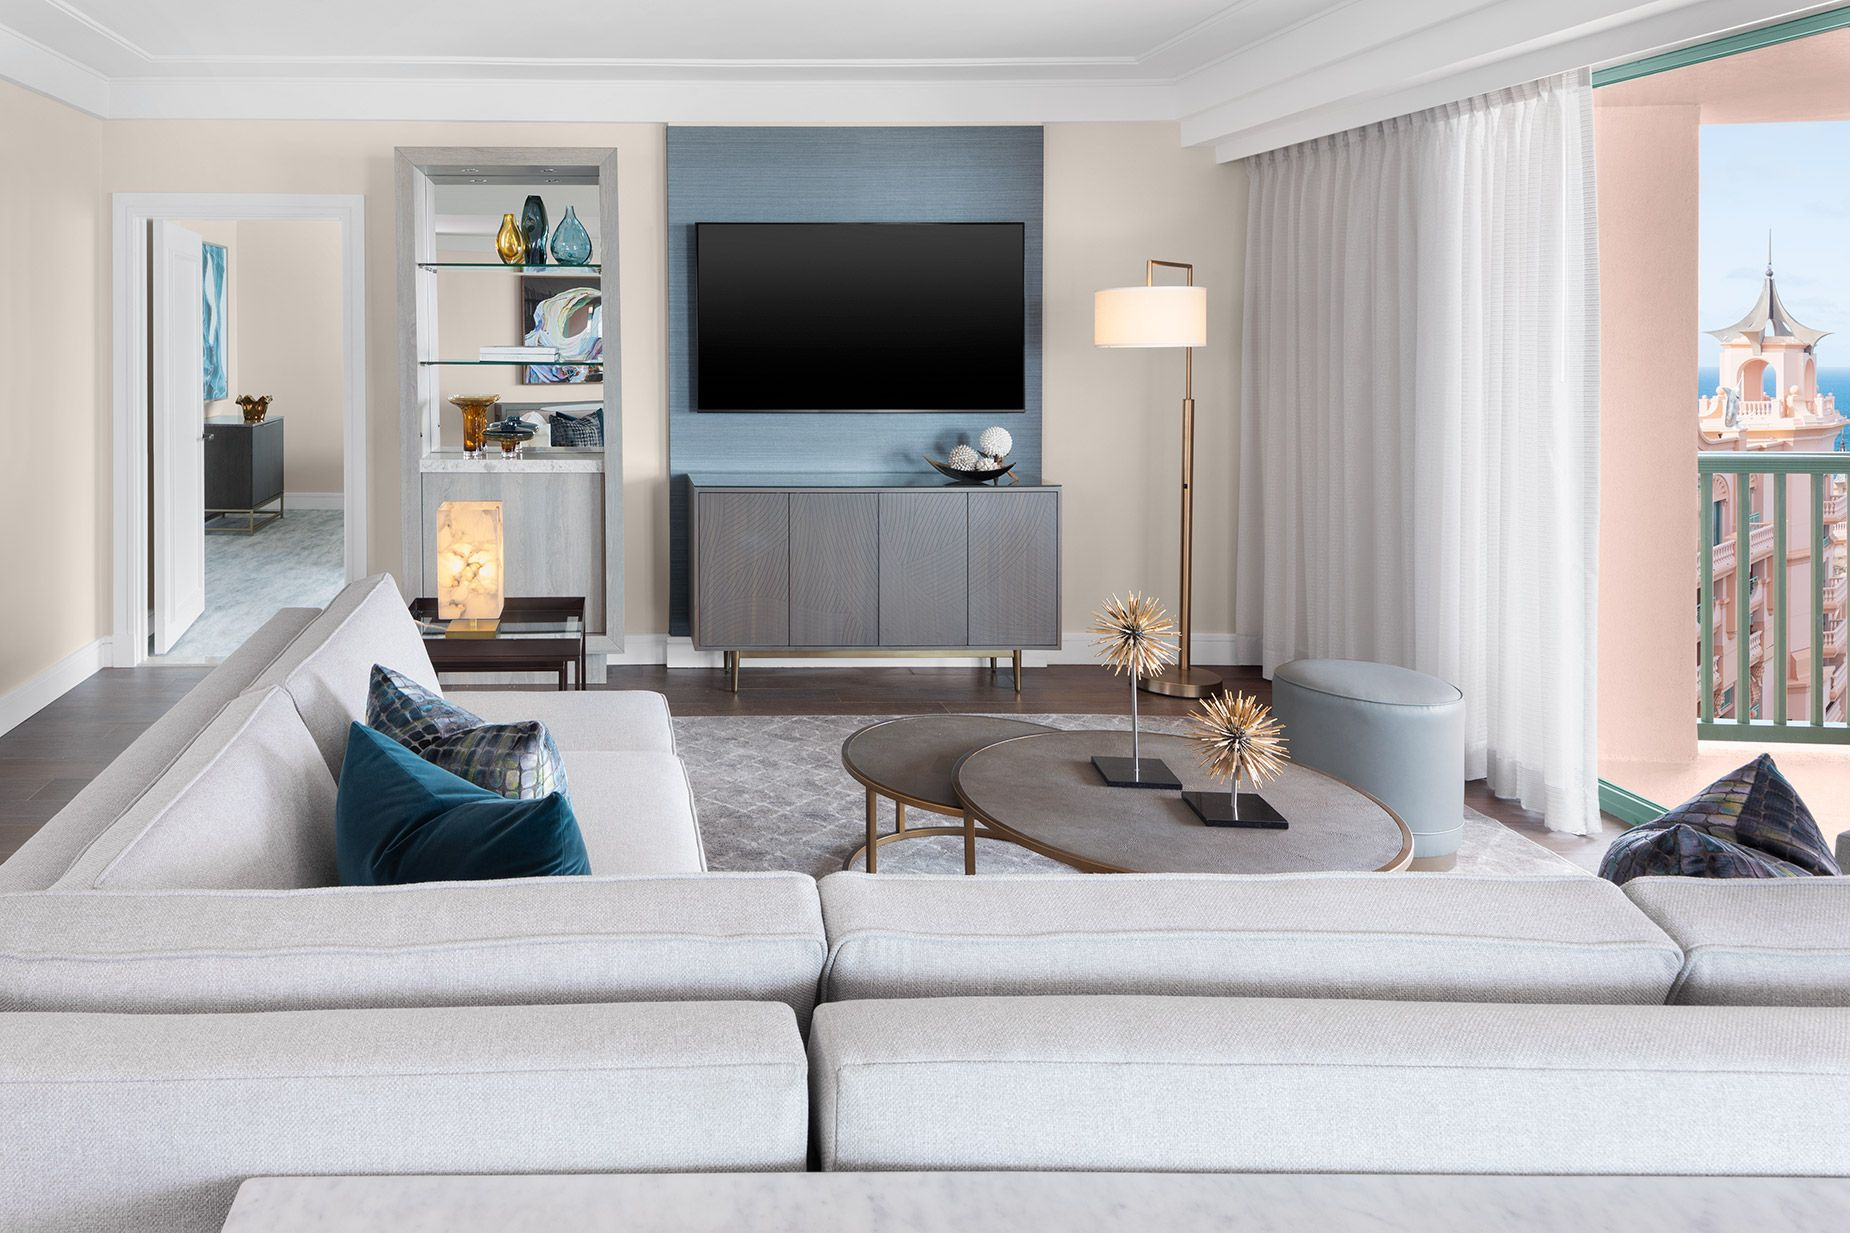 AK_NASAK_Royal_Grand_Suite_Livingroom.jpg